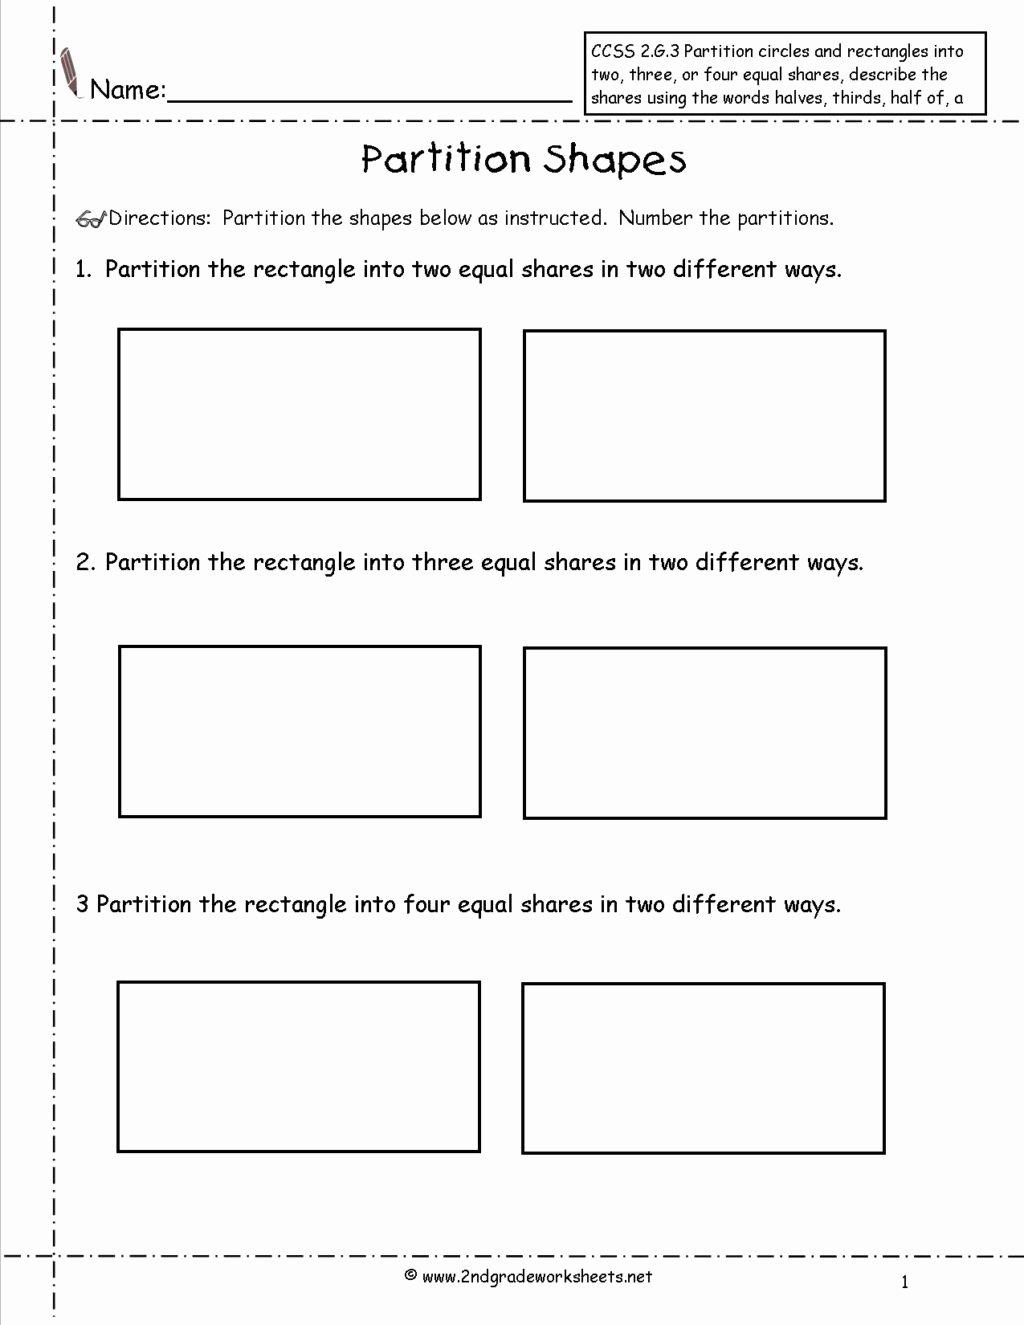 Polygon Worksheets for 2nd Grade Kids Worksheet 2nd Grade Geometry Worksheets Ccss G Partition